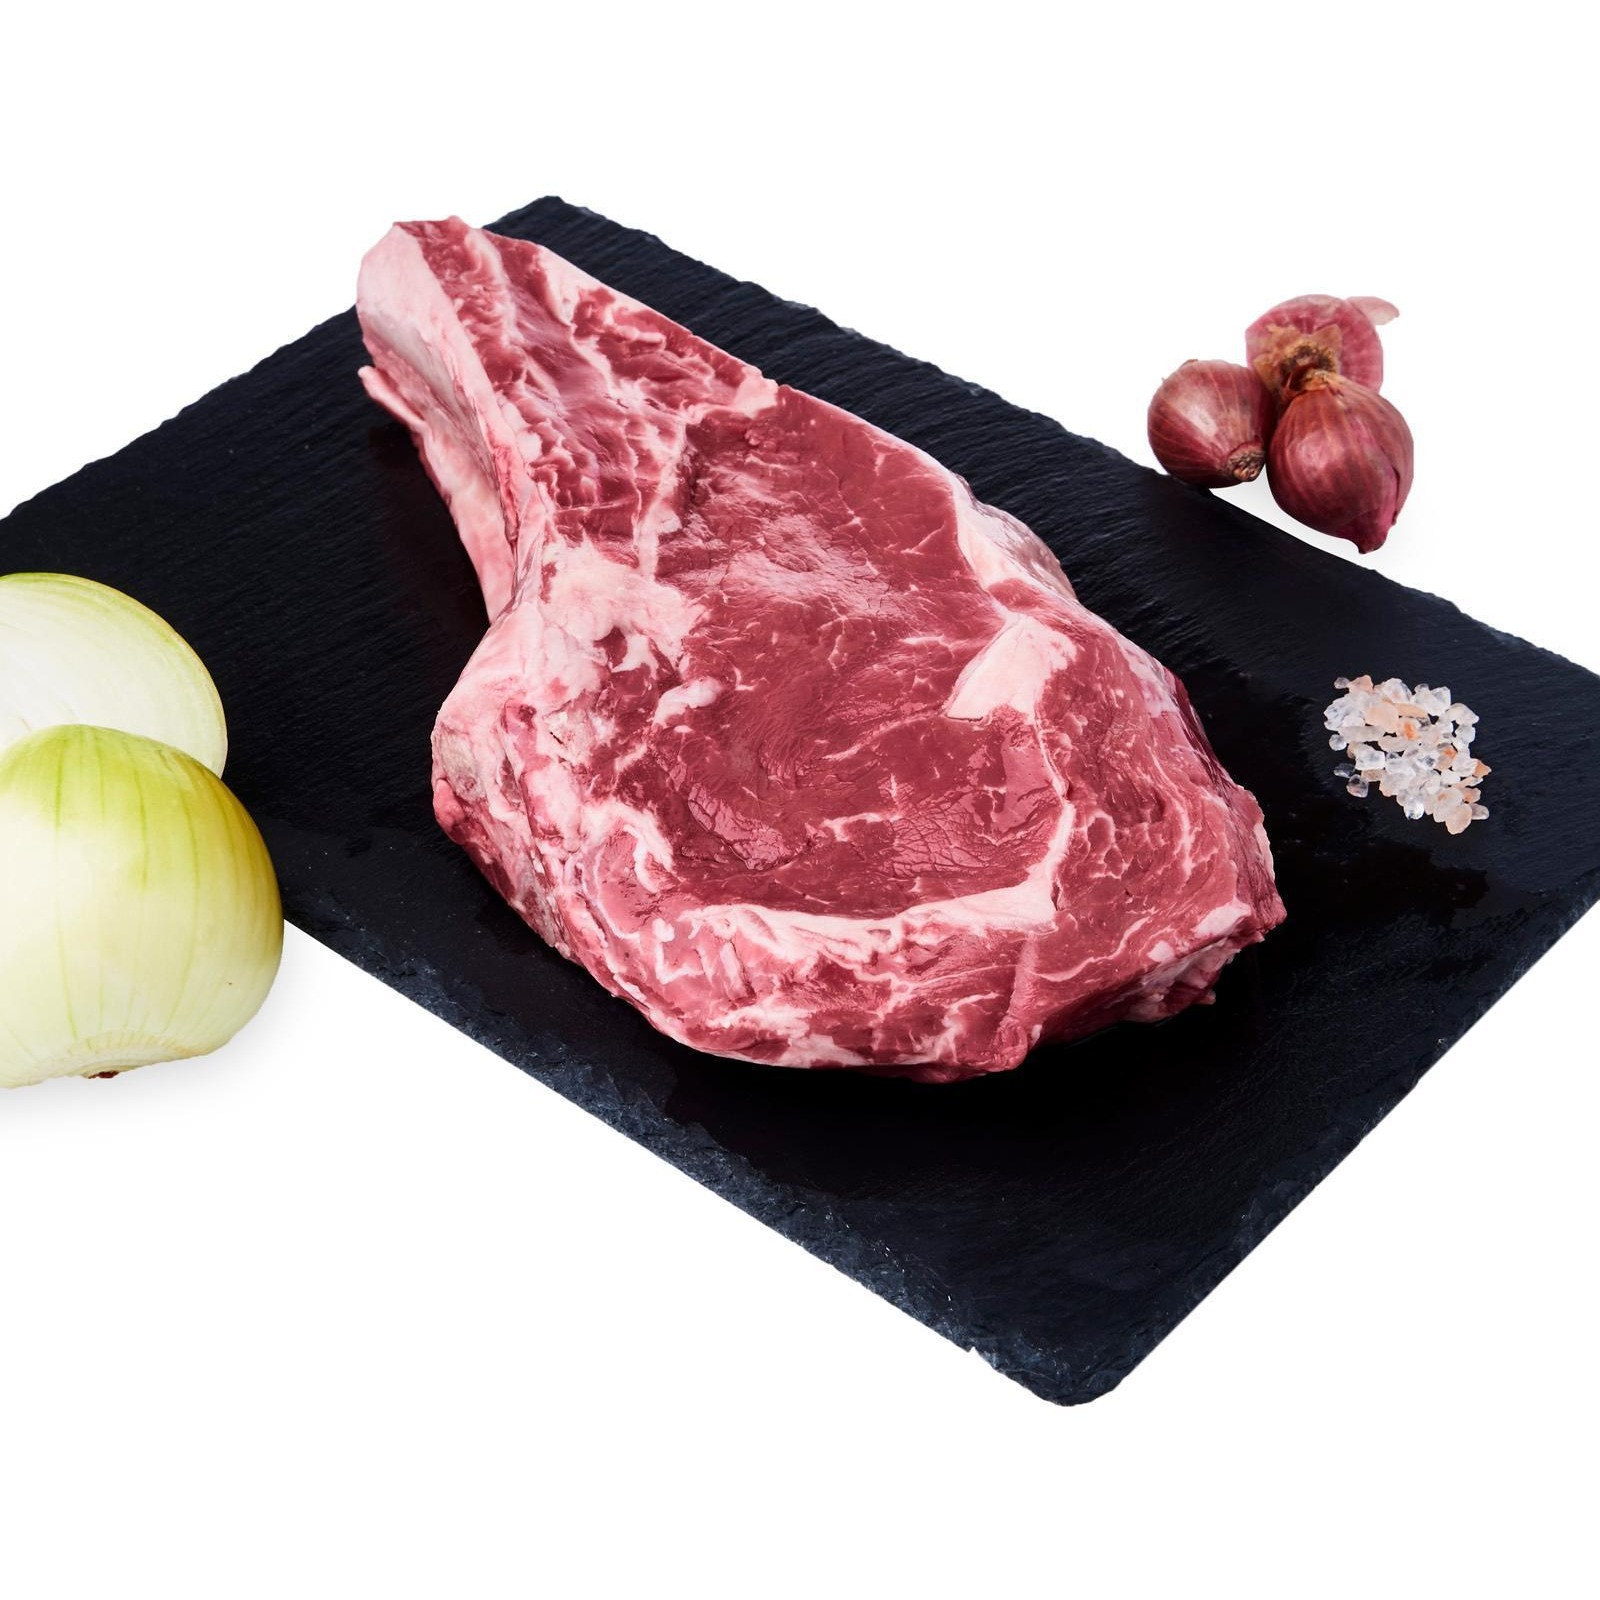 Aw's Market Blck Angus Beef Ribs